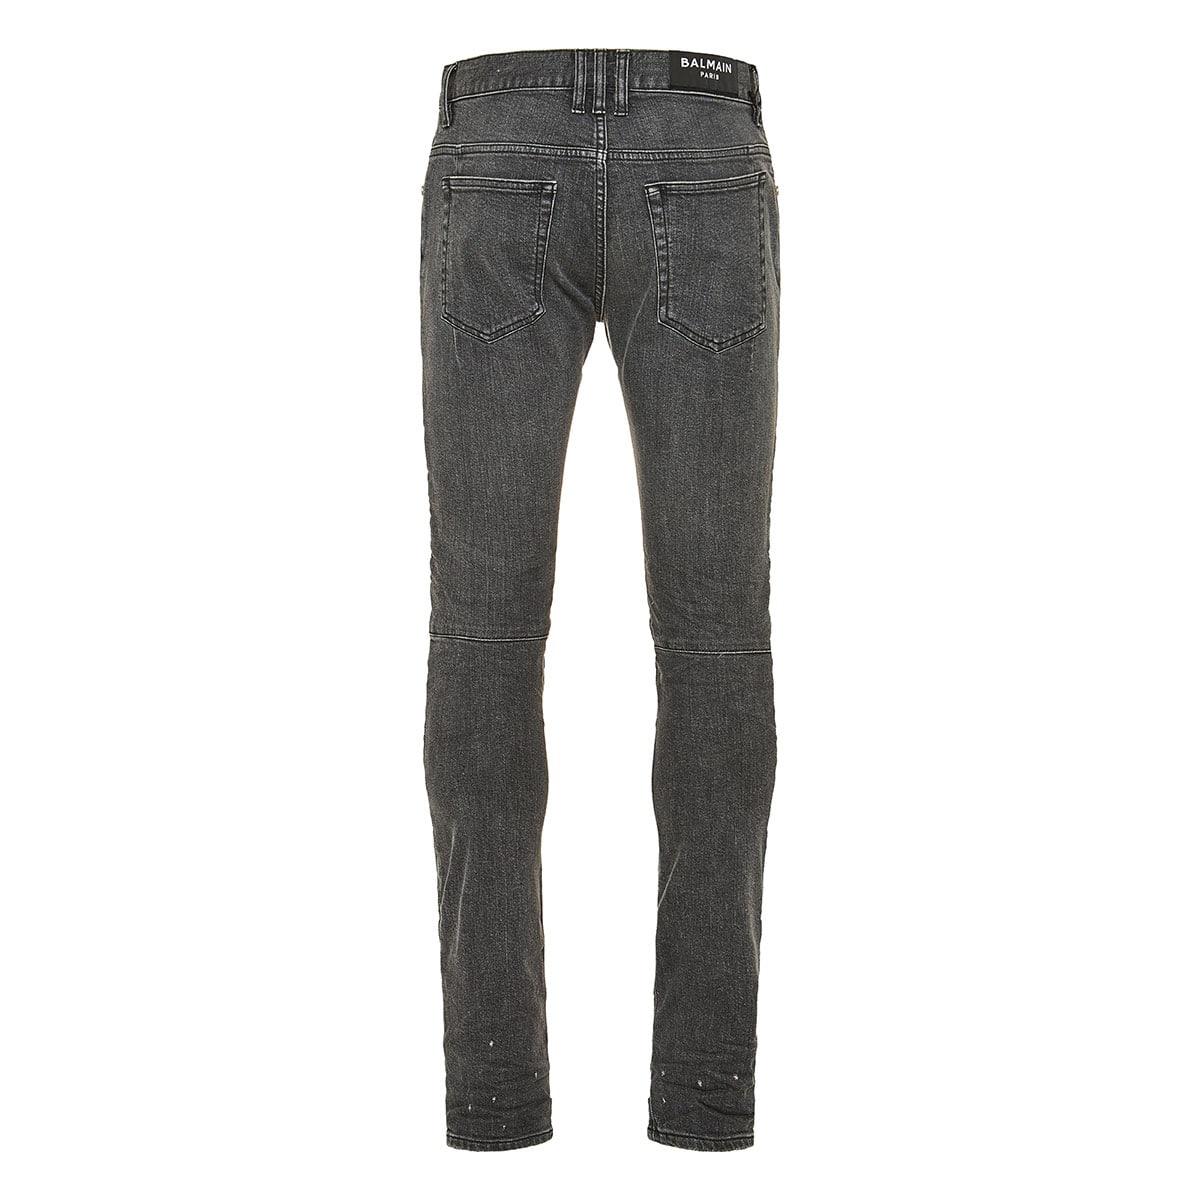 Biker-style ripped skinny jeans